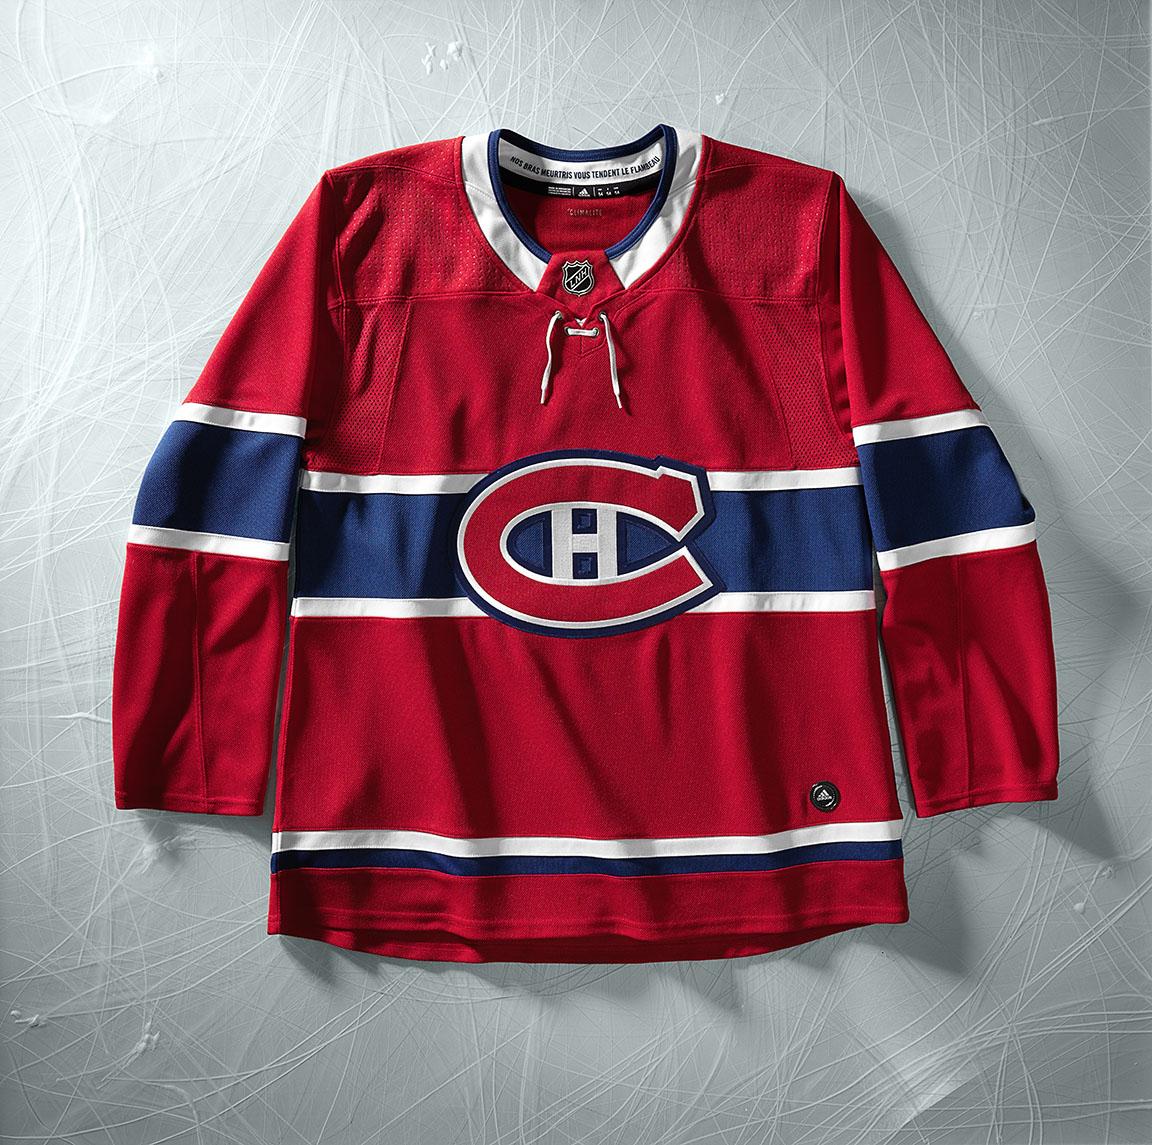 9741bb66d11 nhl adidas adizero Authentic Pro Hockey Jerseys montreal canadiens ...